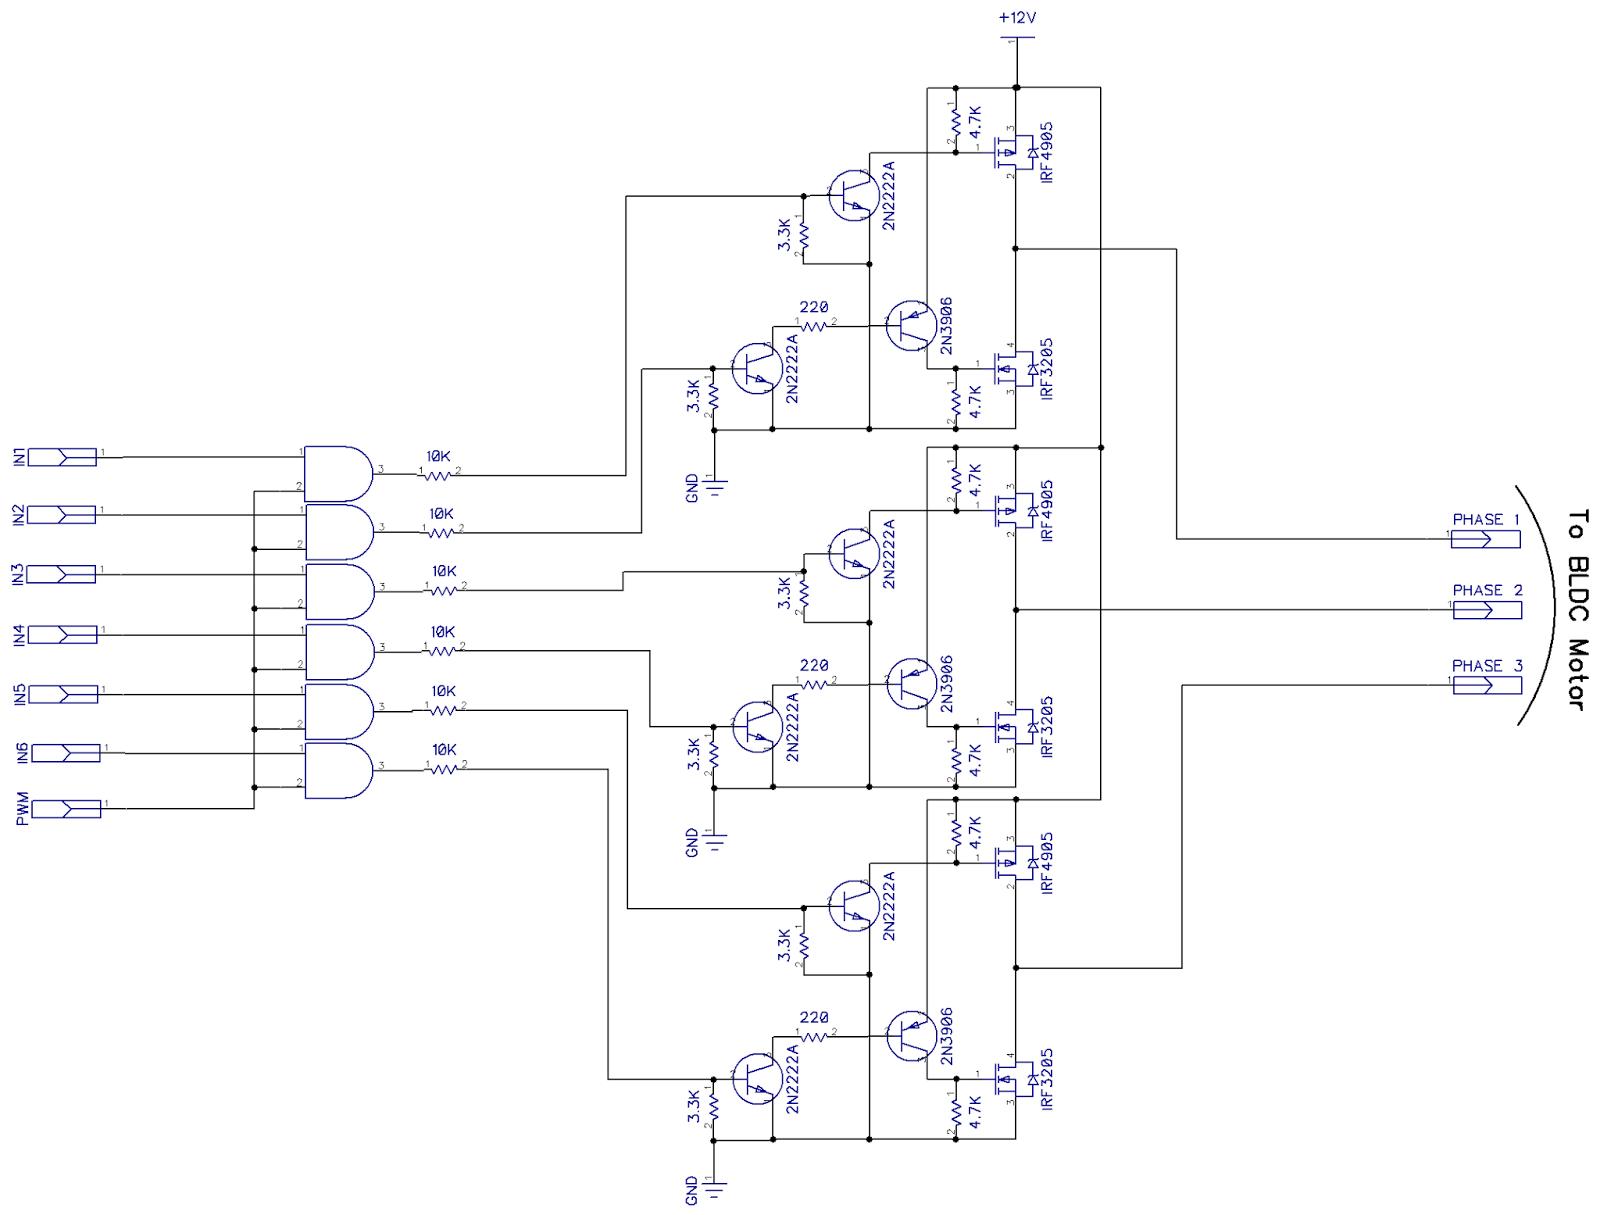 25 Good Sample Of Motor Control Panel Wiring Diagram